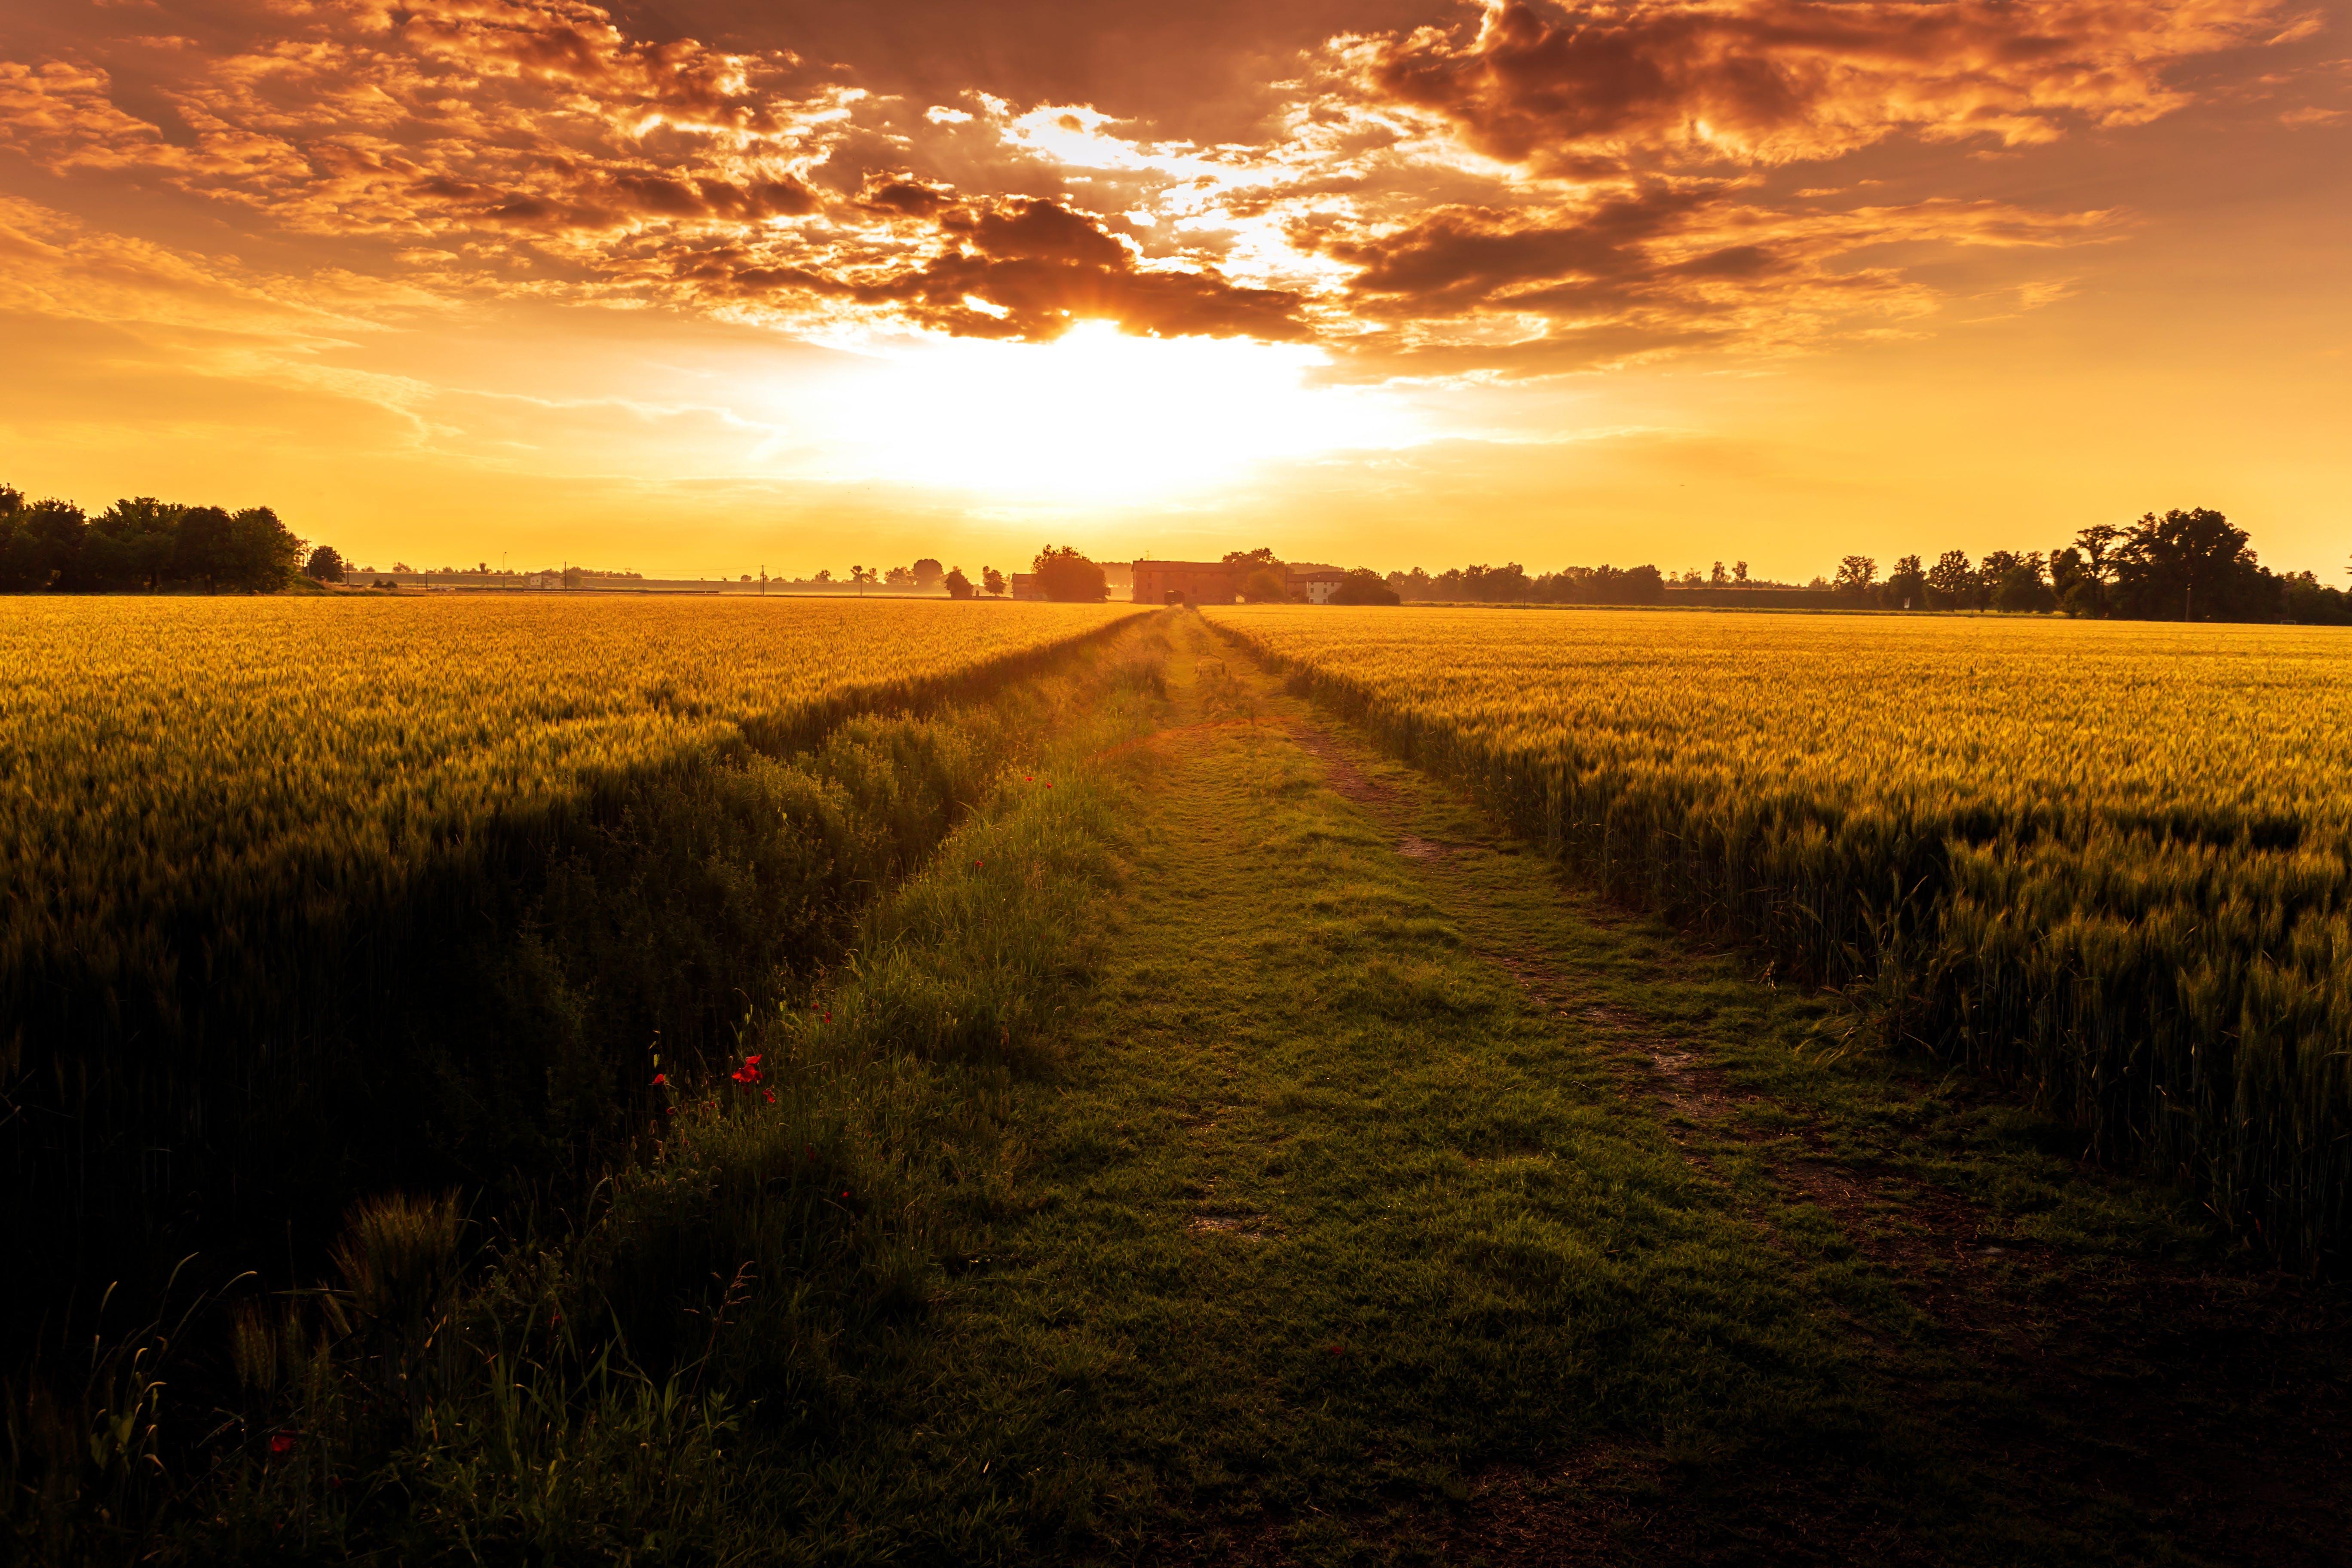 Grass Field Pathway